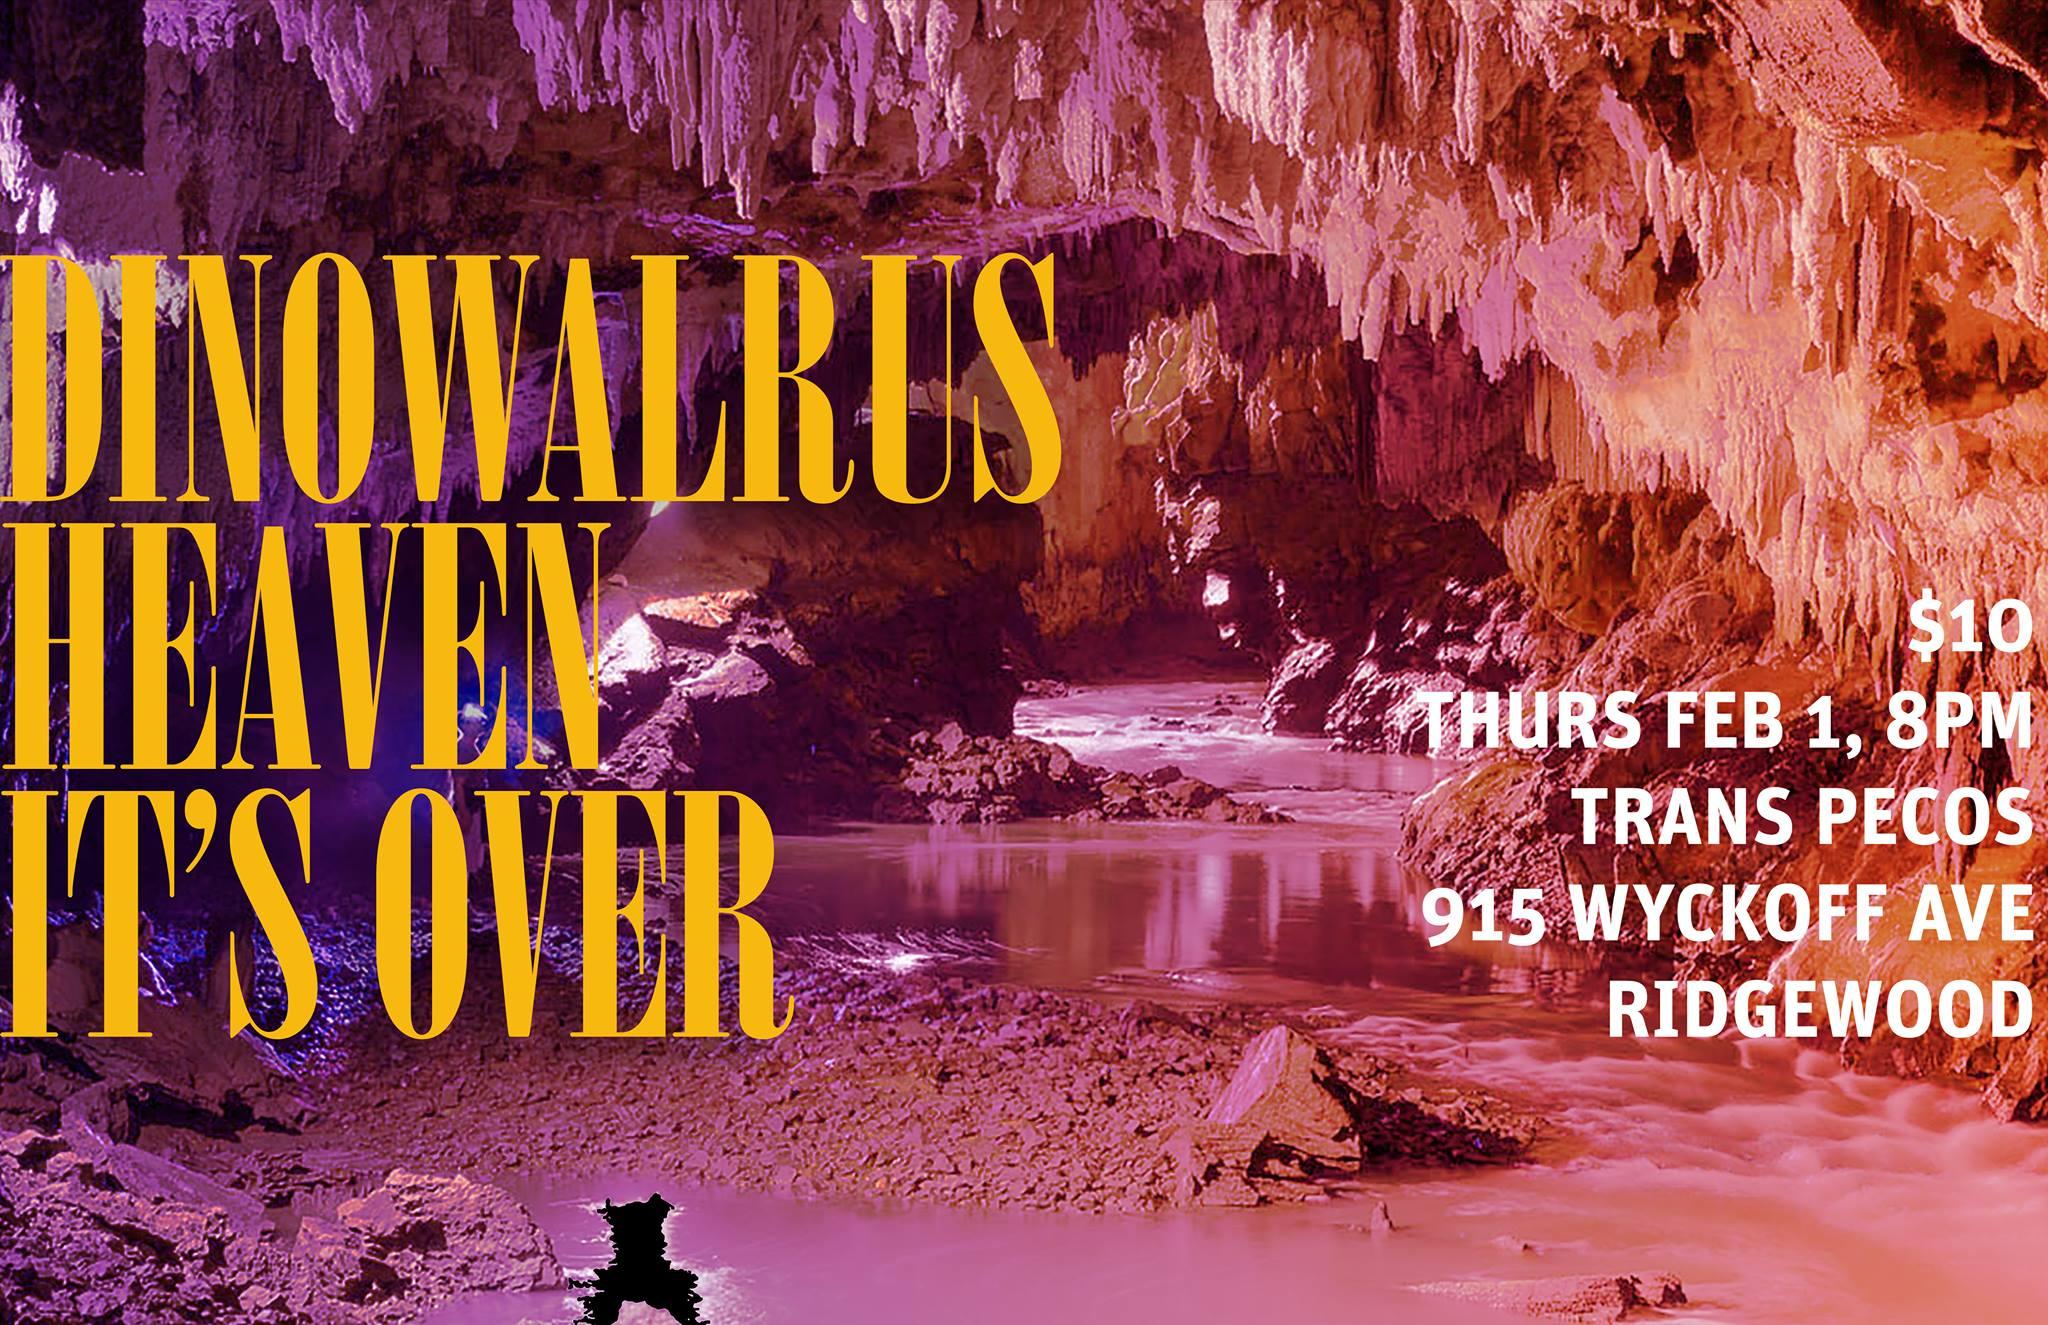 DINOWALRUS  facebook.com/dinowalrus   https://soundcloud.com/dinowalrus   HEAVEN  https://www.facebook.com/HeavenbandNYC/   http://heavennyc.bandcamp.com/   IT'S OVER  https://itsoveritsoveritsover.bandcamp.com/